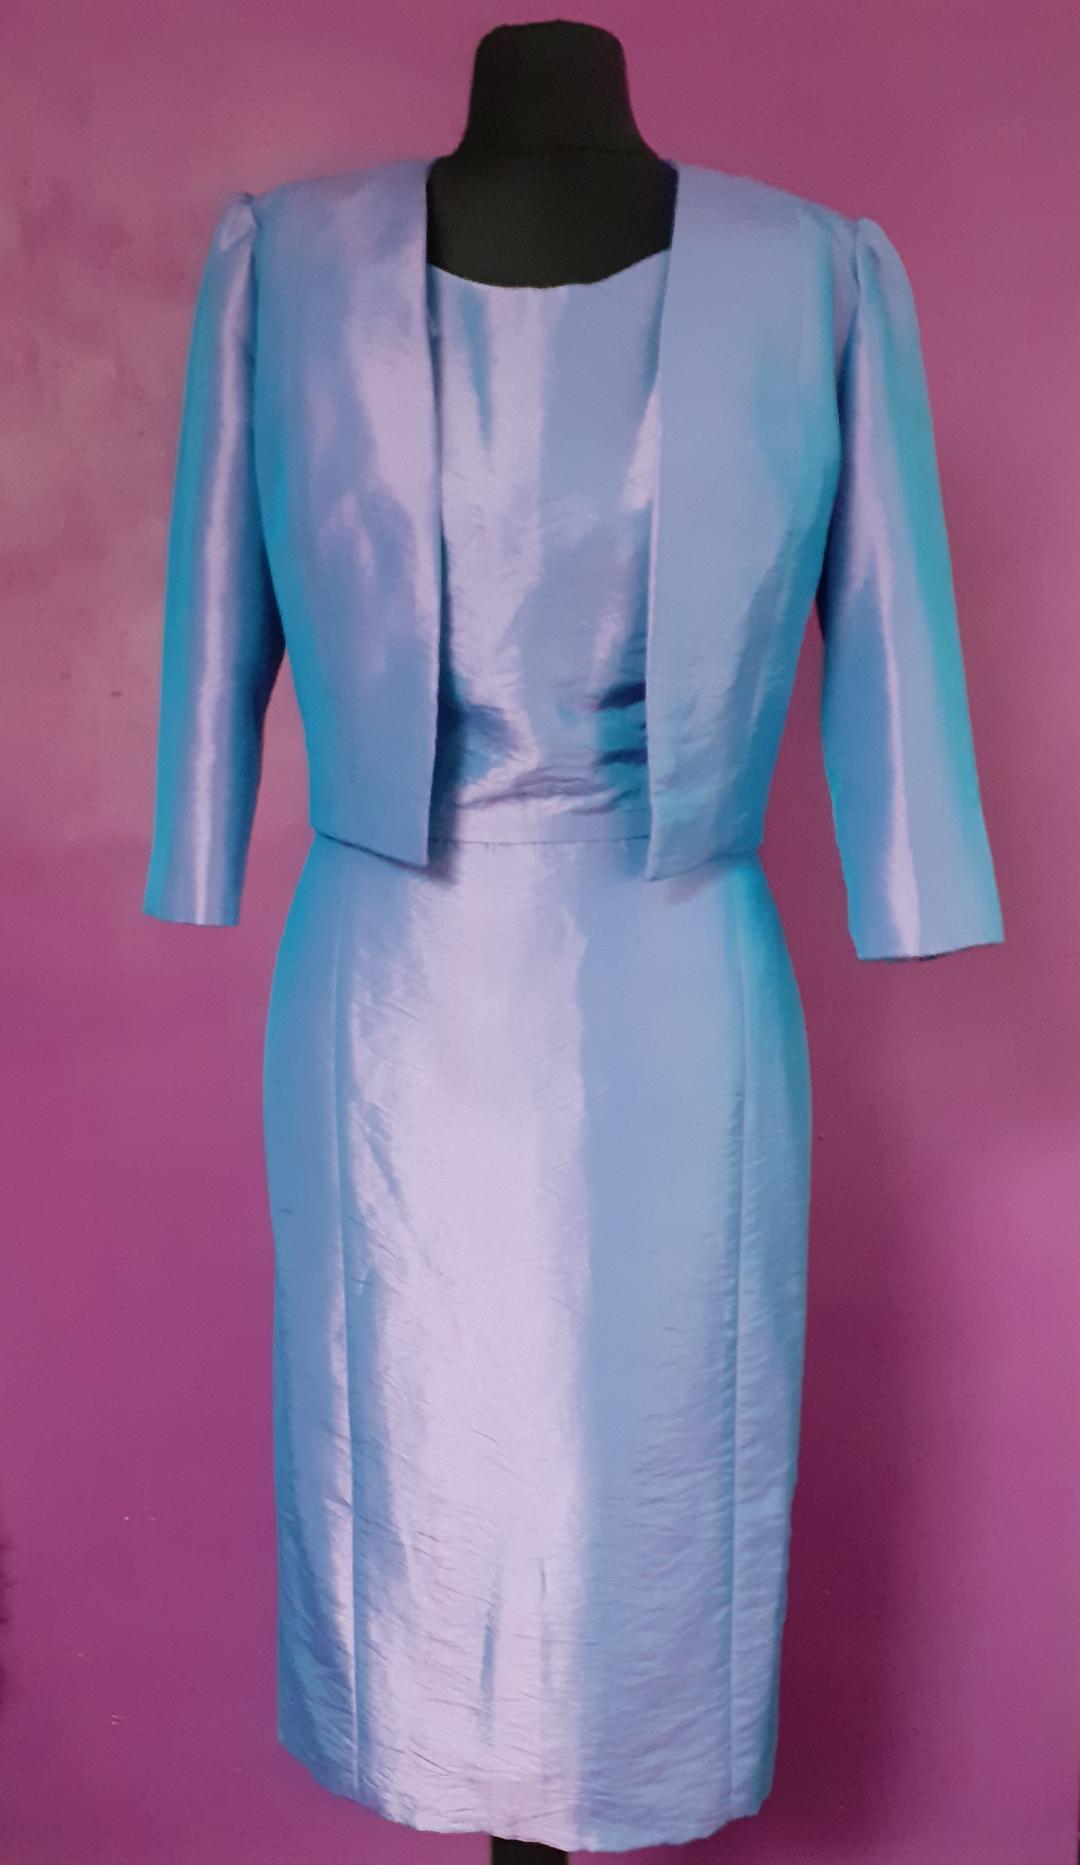 MOTB dress front- jenny dixon- jennydixoncouture.com